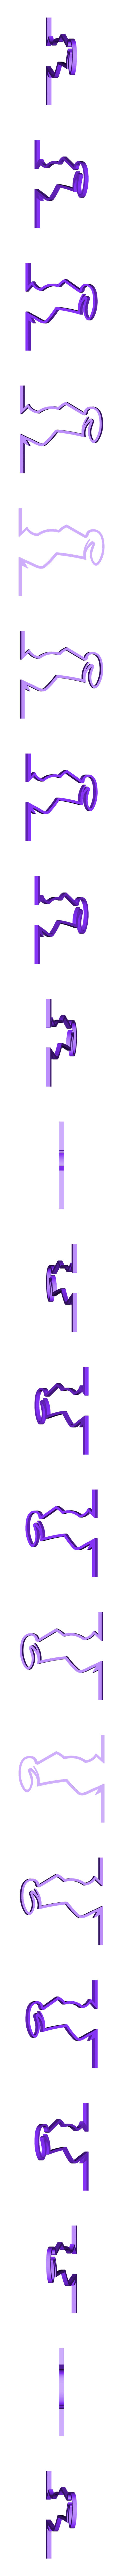 259046af cb01 44c0 9548 f59c40c8ce8f